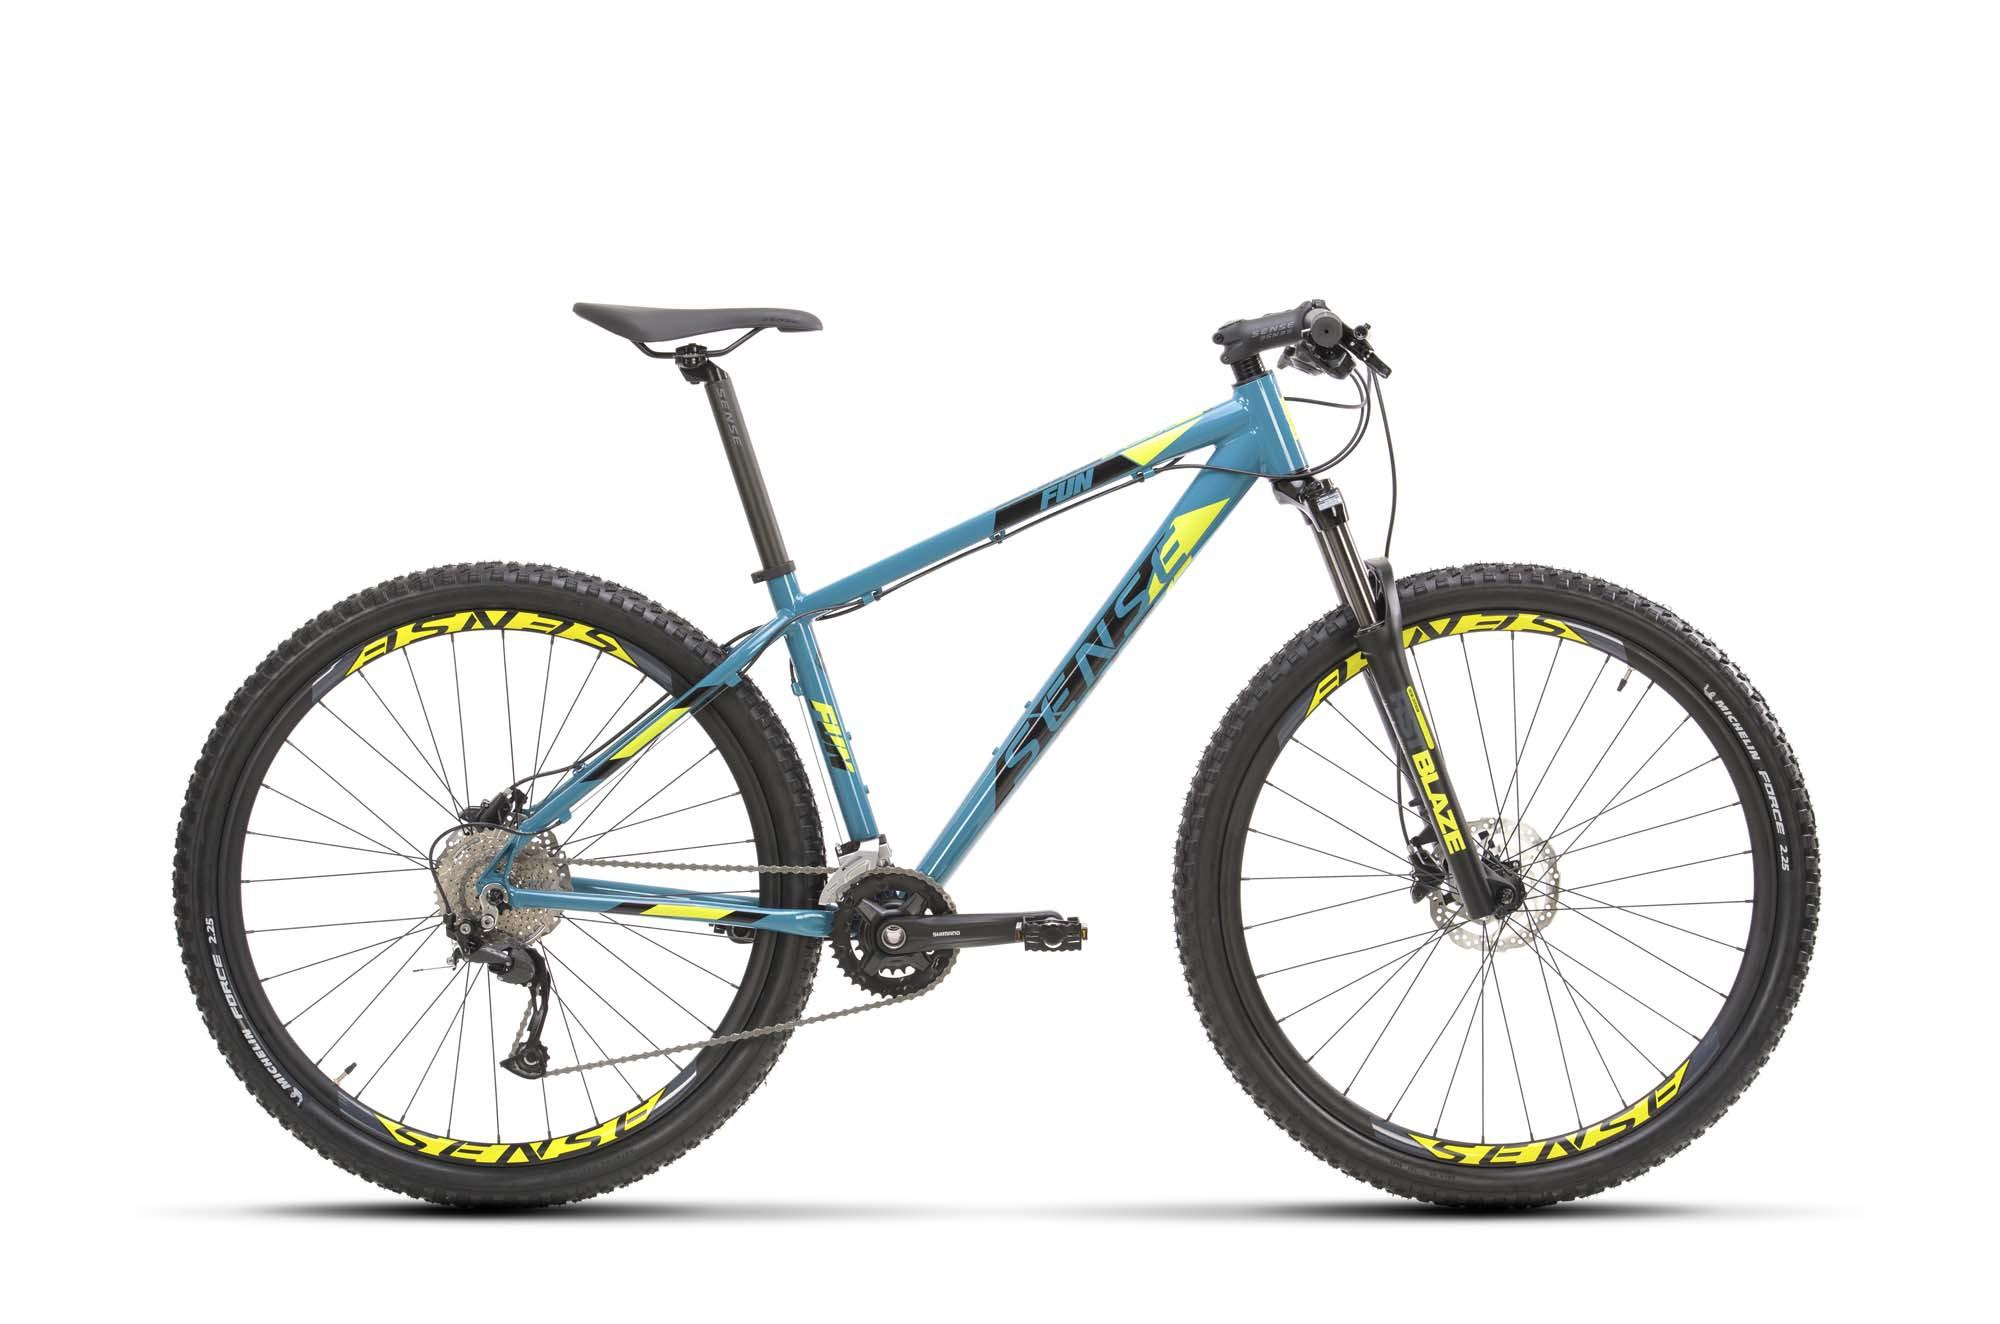 Bicicleta Sense Fun Evo 2021 TAM M